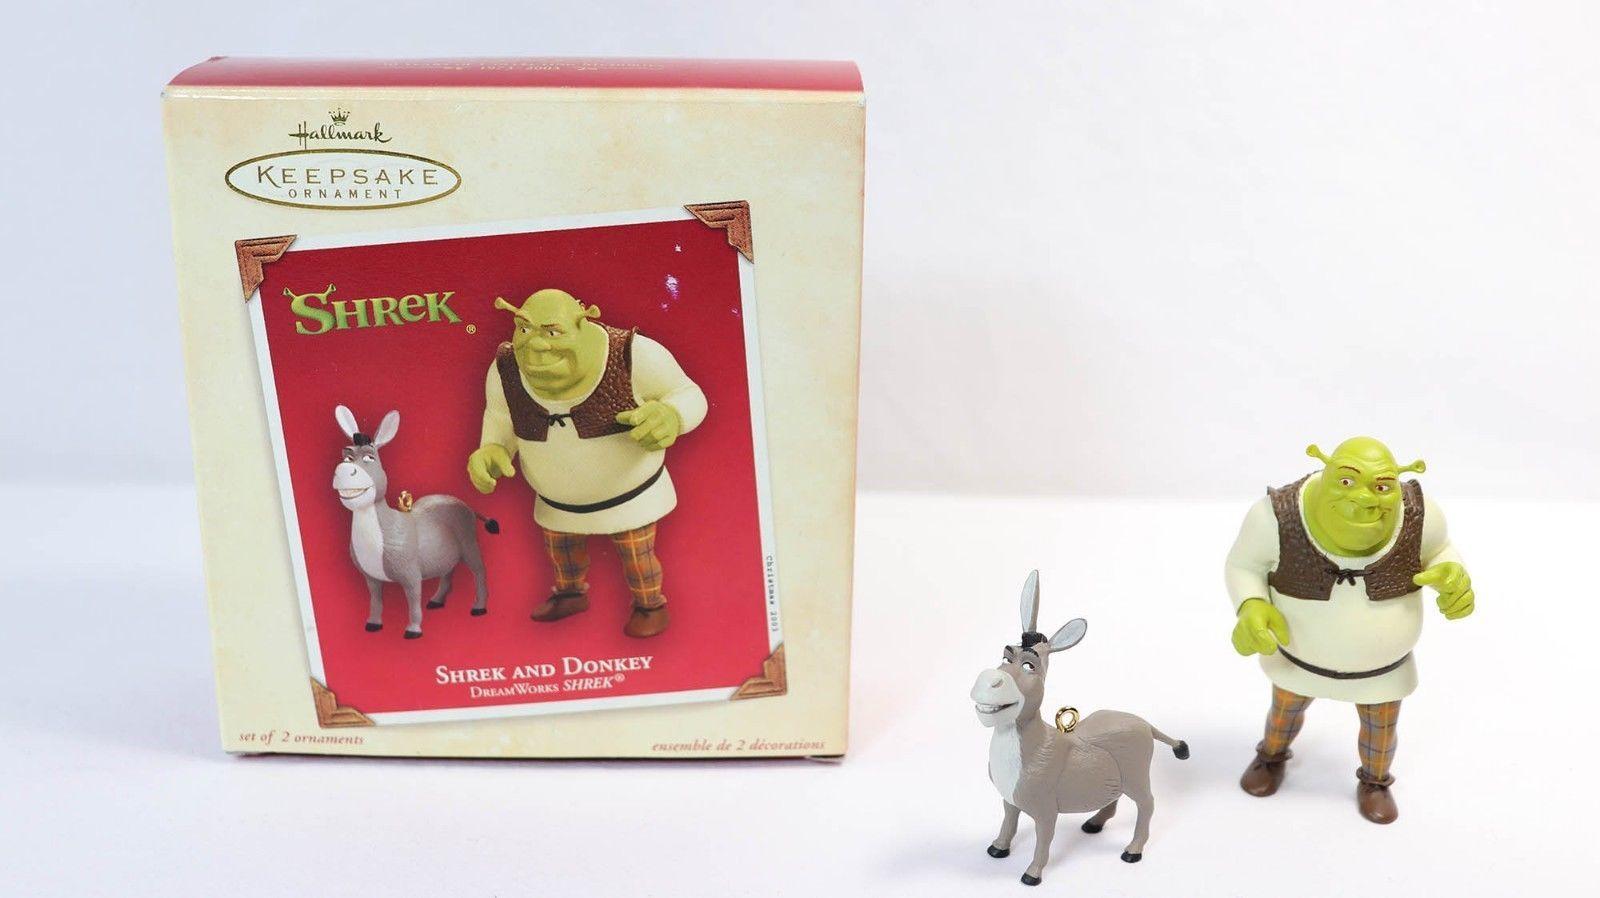 Donkey Christmas Ornaments.Hallmark Keepsake Christmas Ornament Shrek And 50 Similar Items